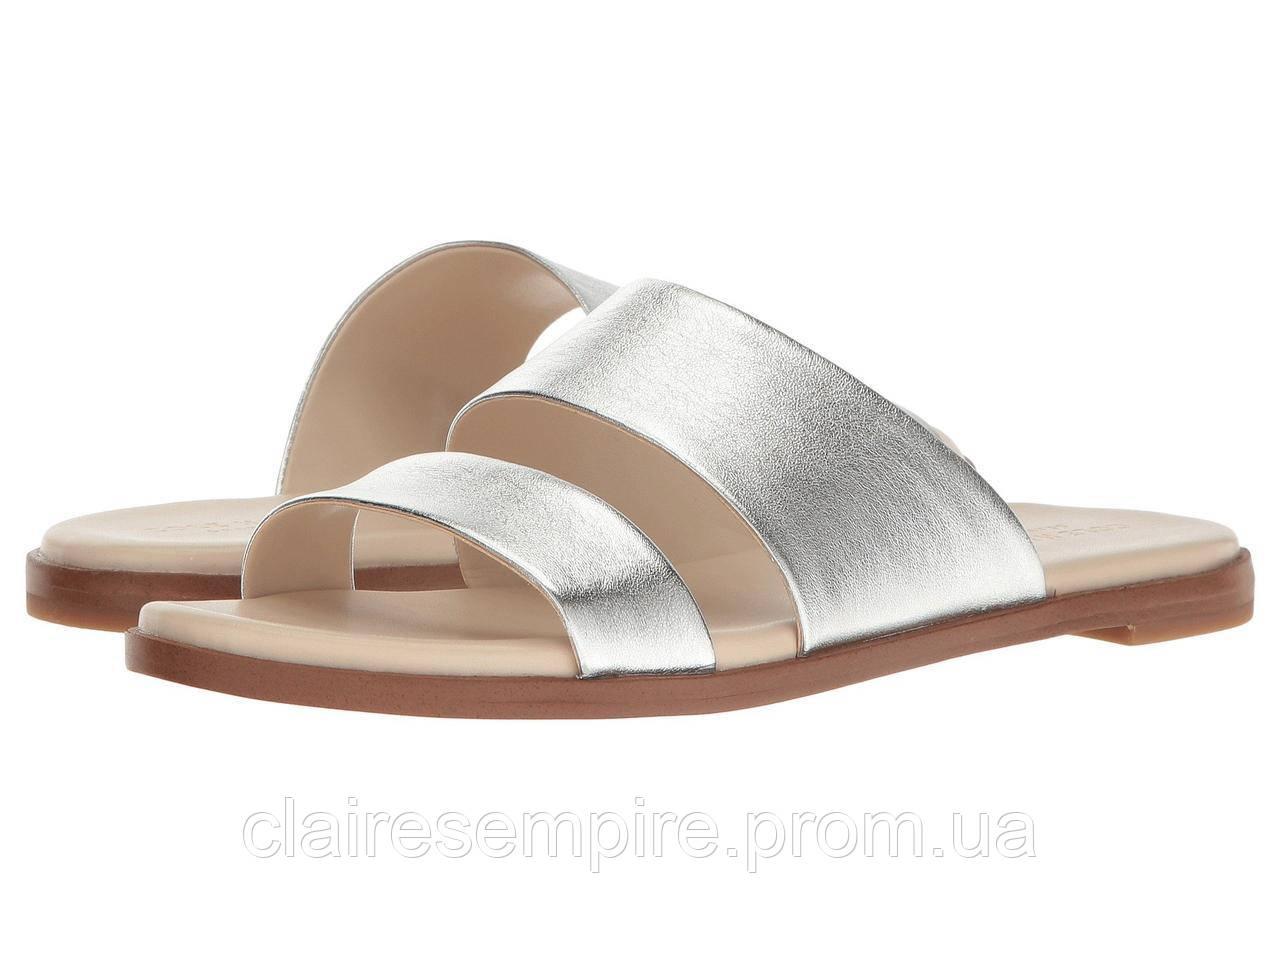 Кожаные сандалии Cole Haan, оригинал, Серебро 38